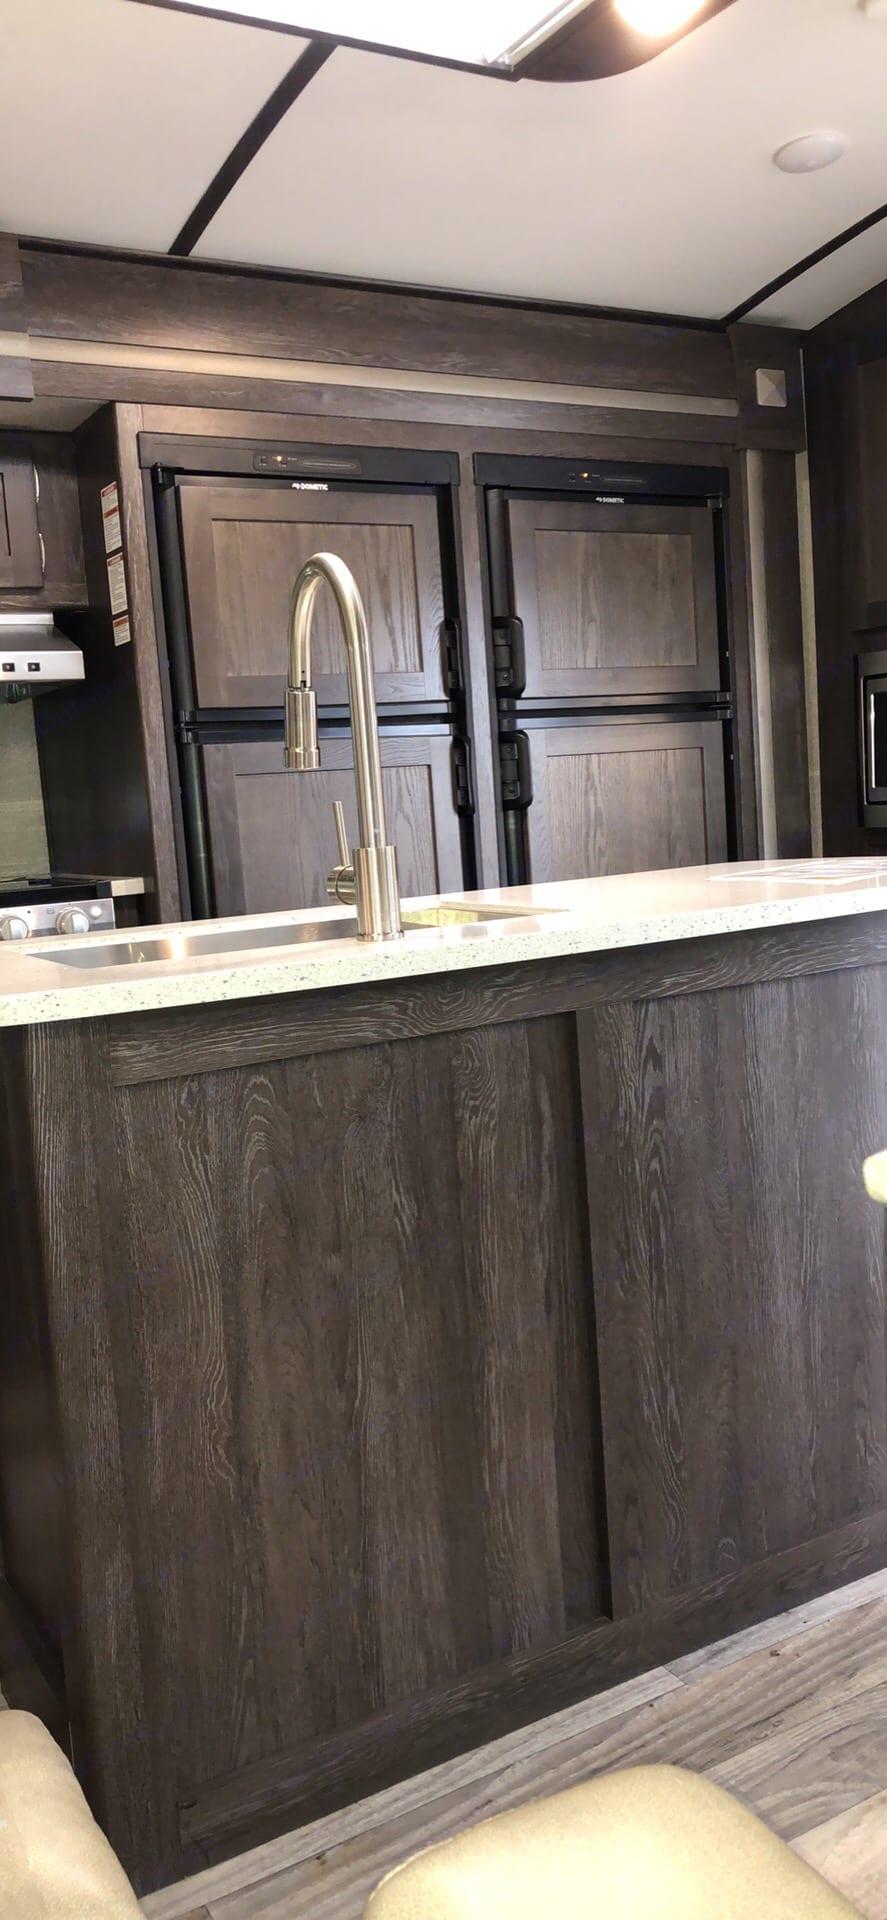 Camper has 2 refrigerators!. Keystone Outback 2019